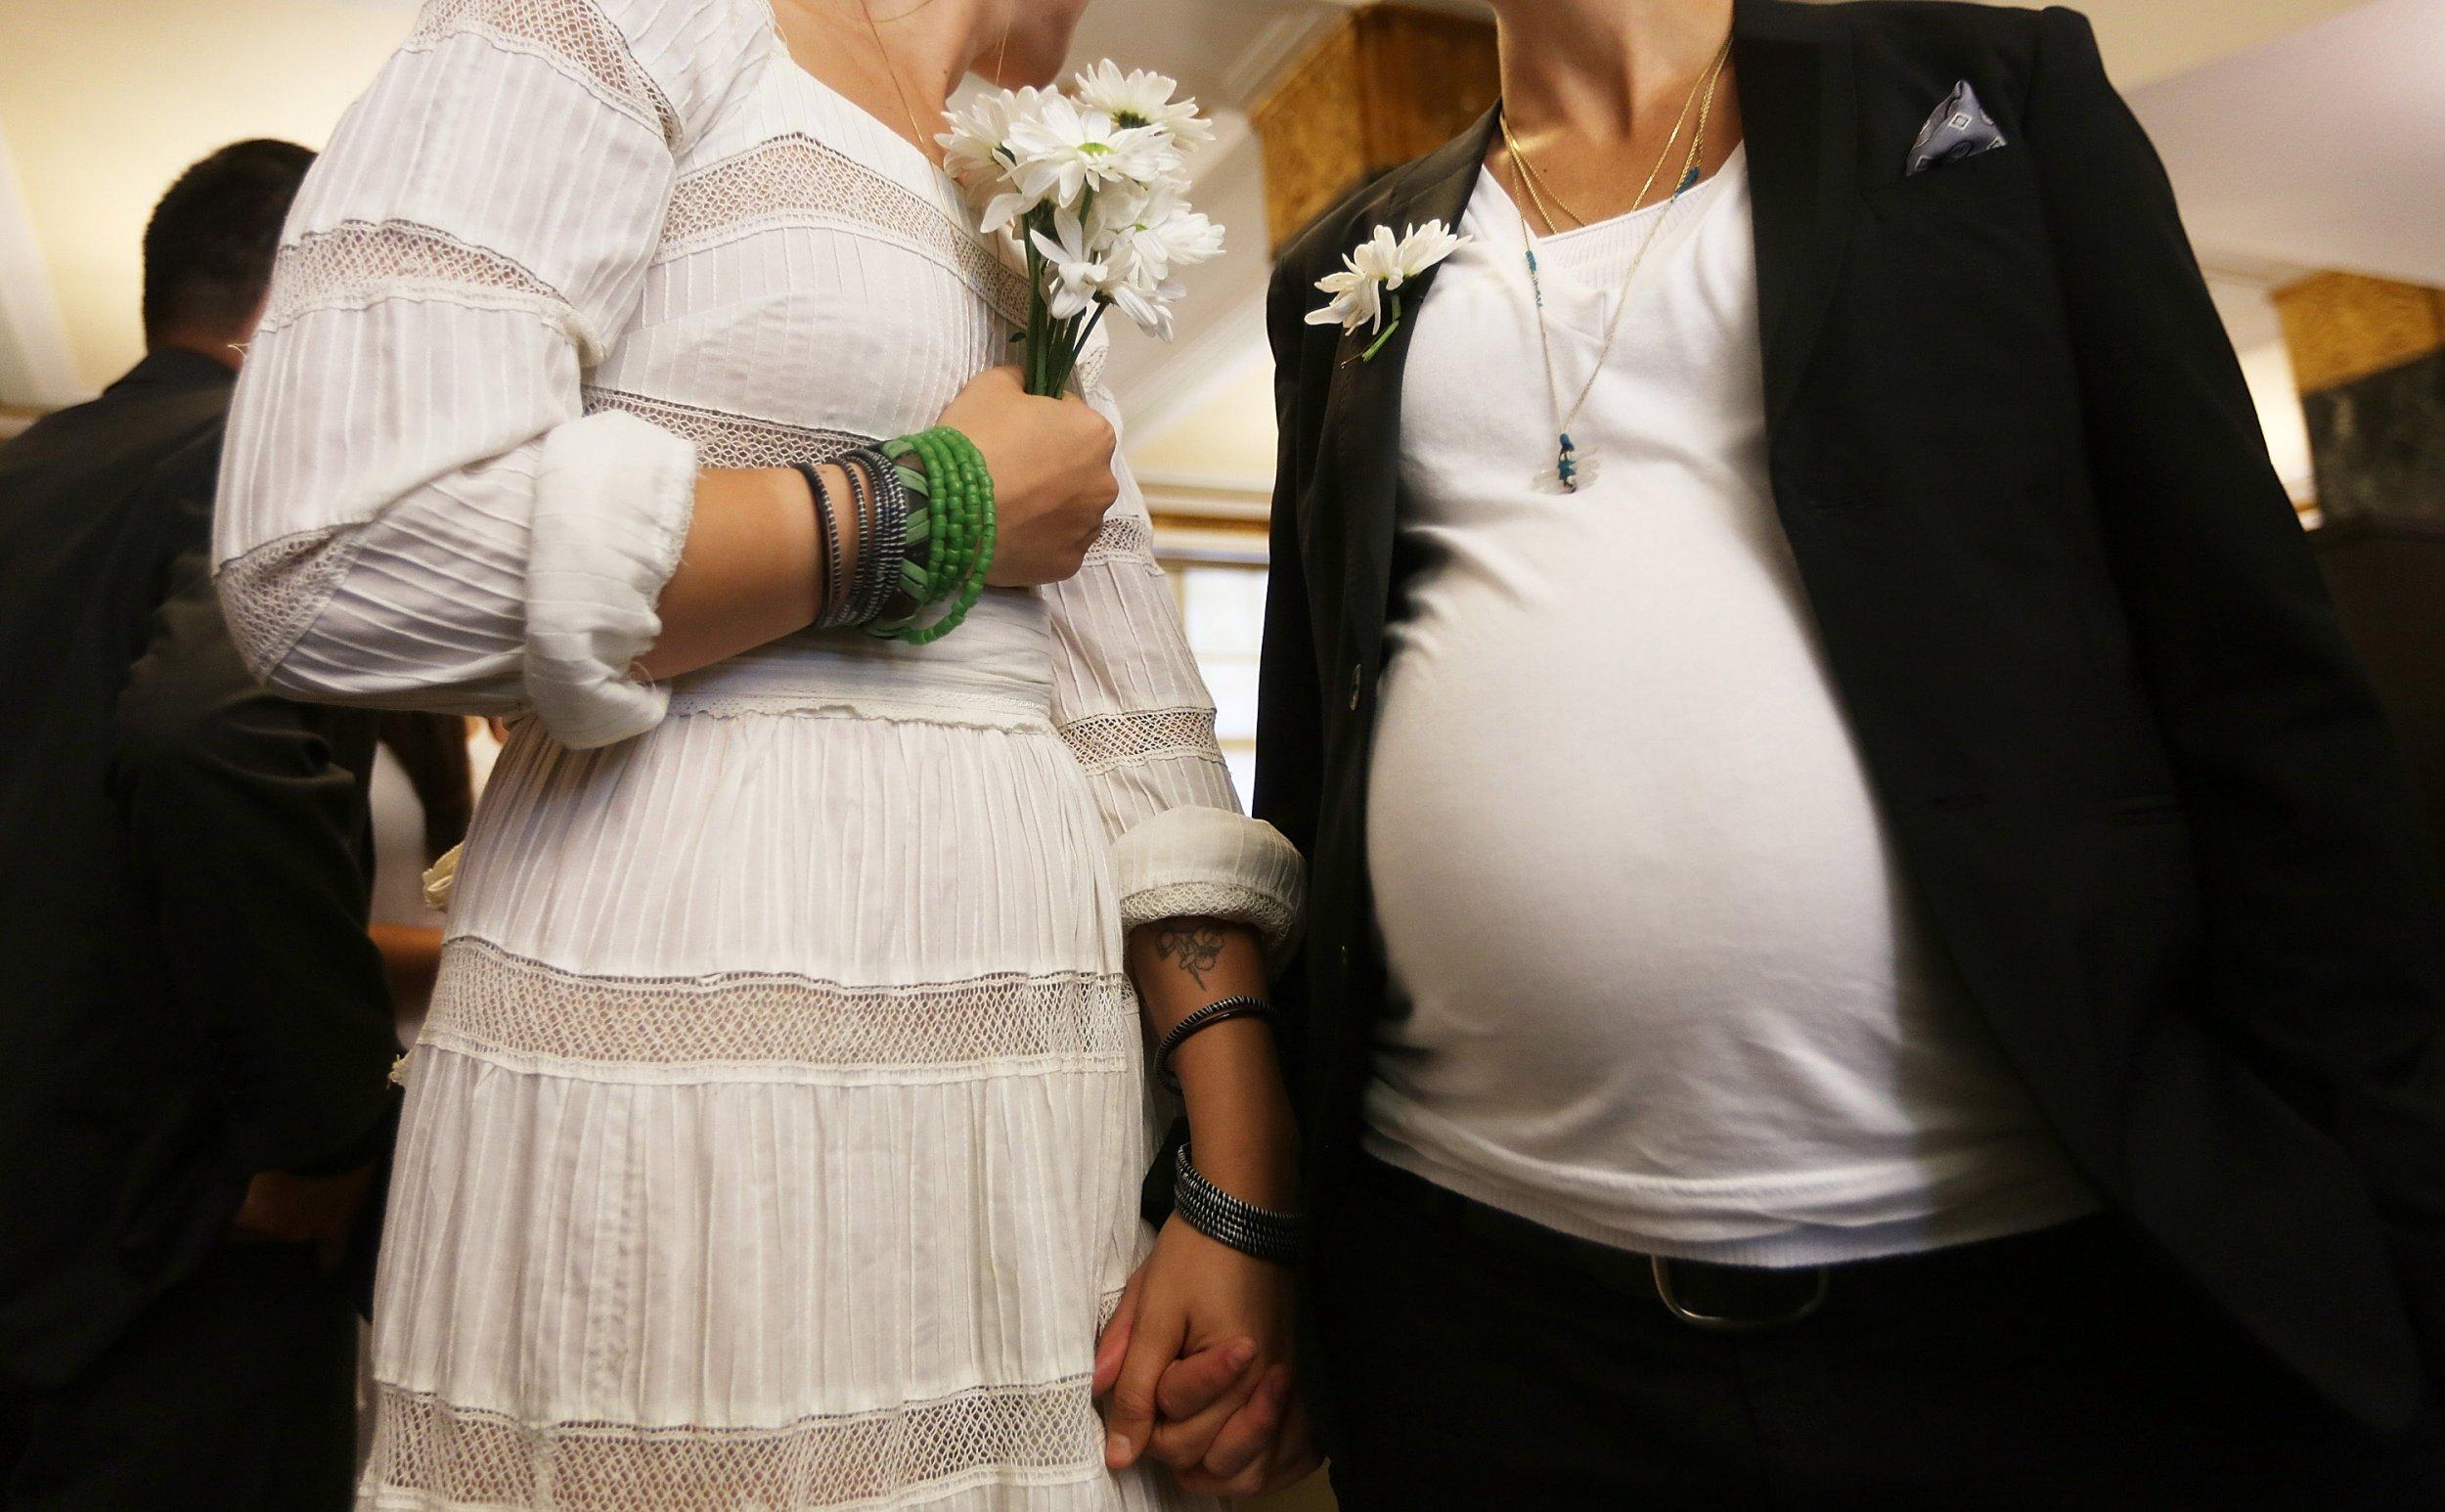 Transgender Women May Soon Have Babies, Fertility Expert Says